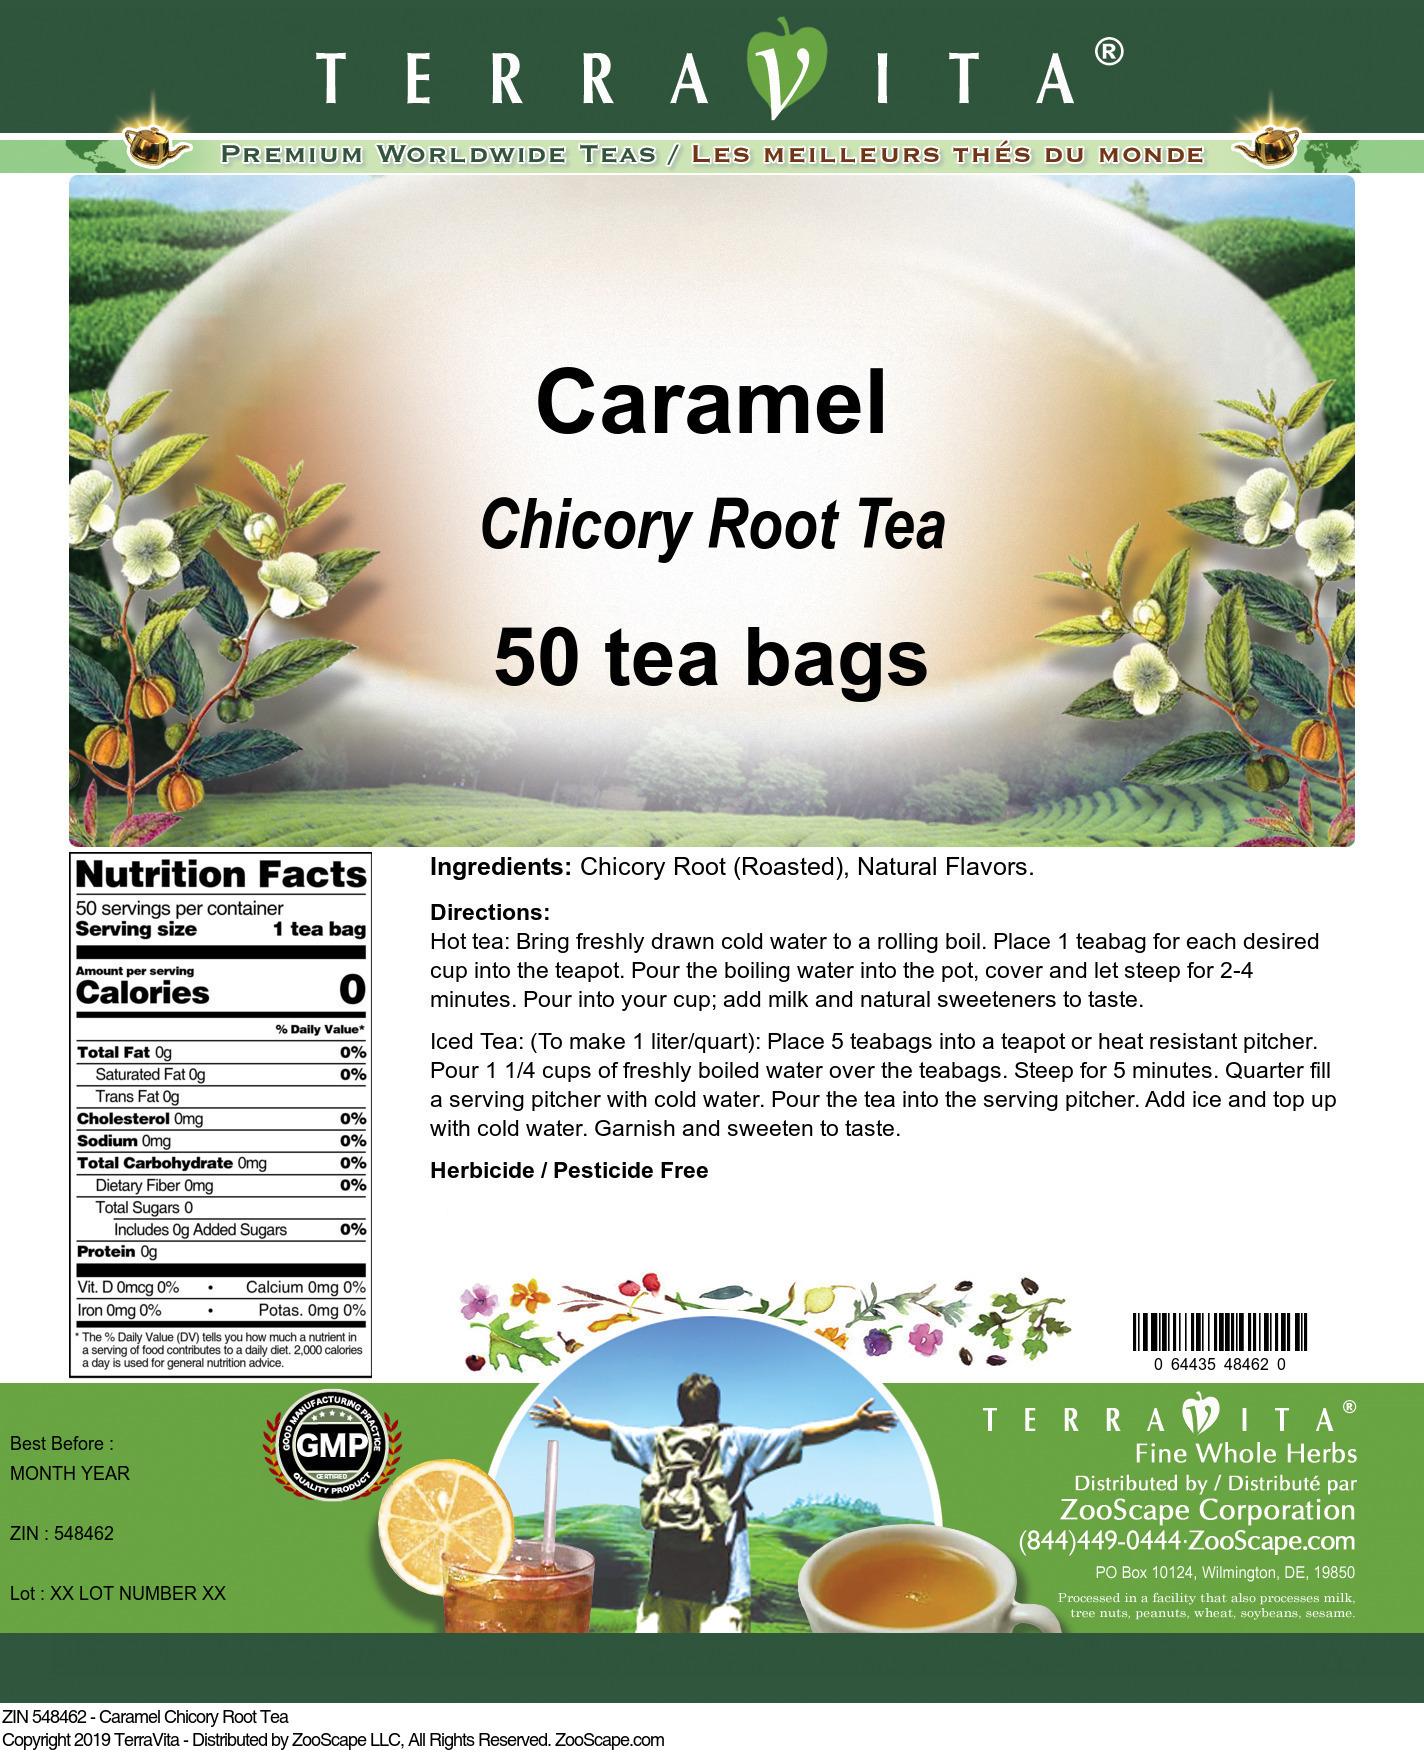 Caramel Chicory Root